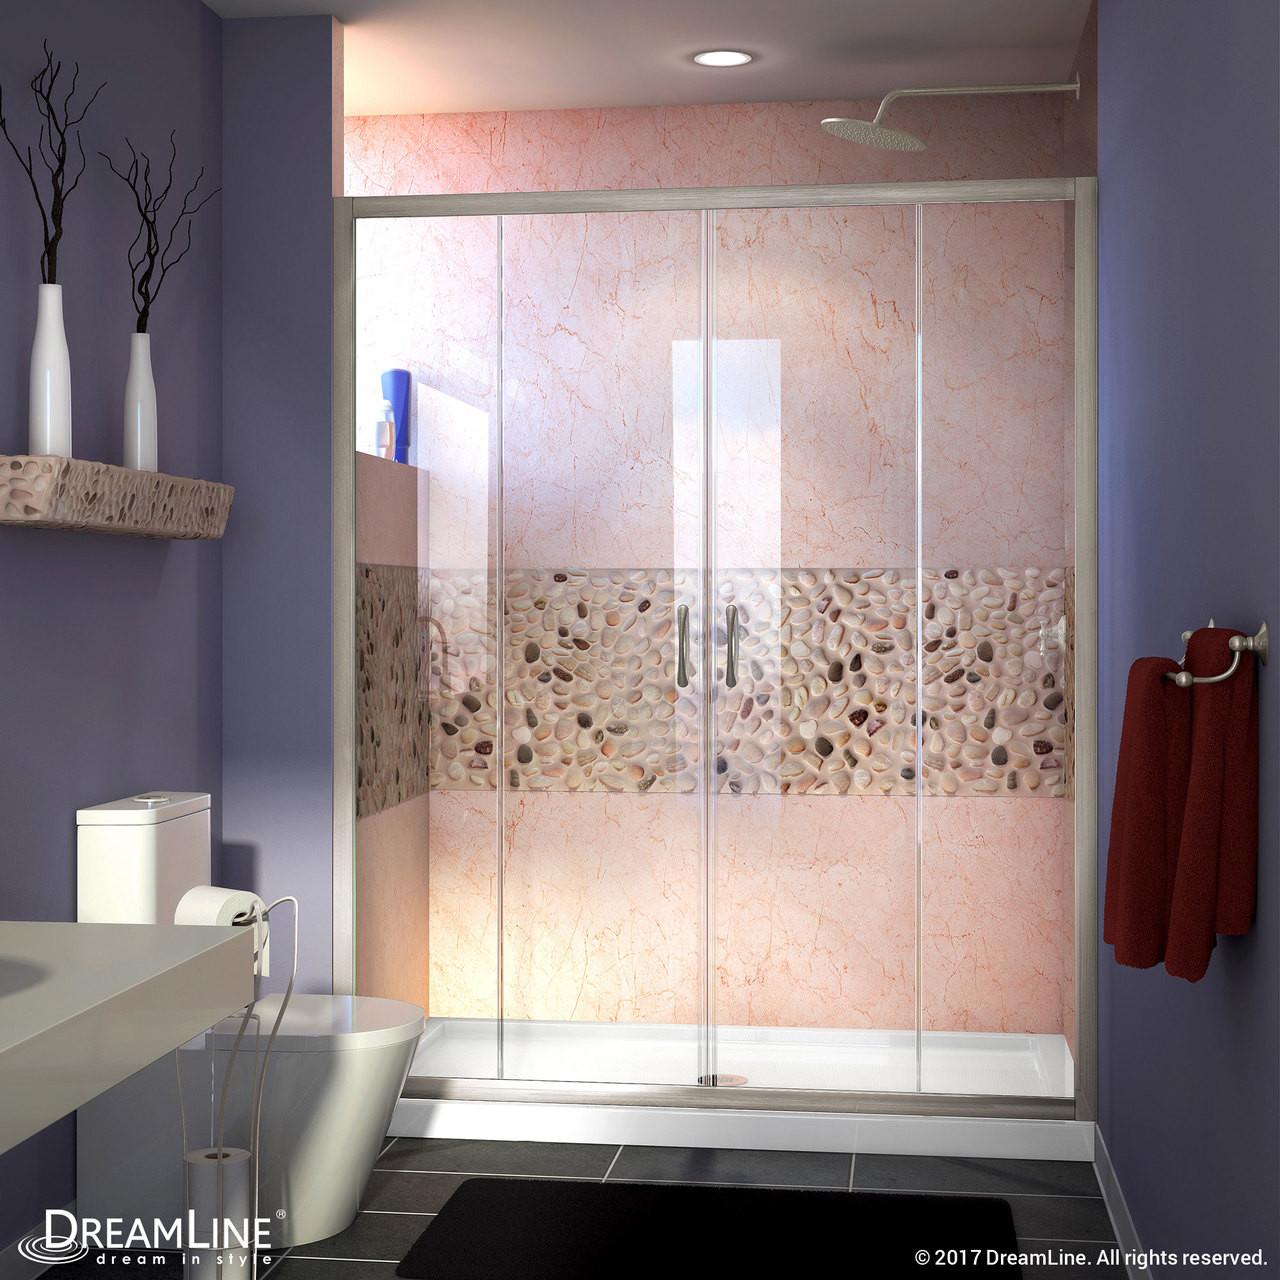 Dreamline Shdr 1160726 04 Visions 56 60 In W X 72 In H Semi Frameless Sliding Shower Door In Brushed Nickel